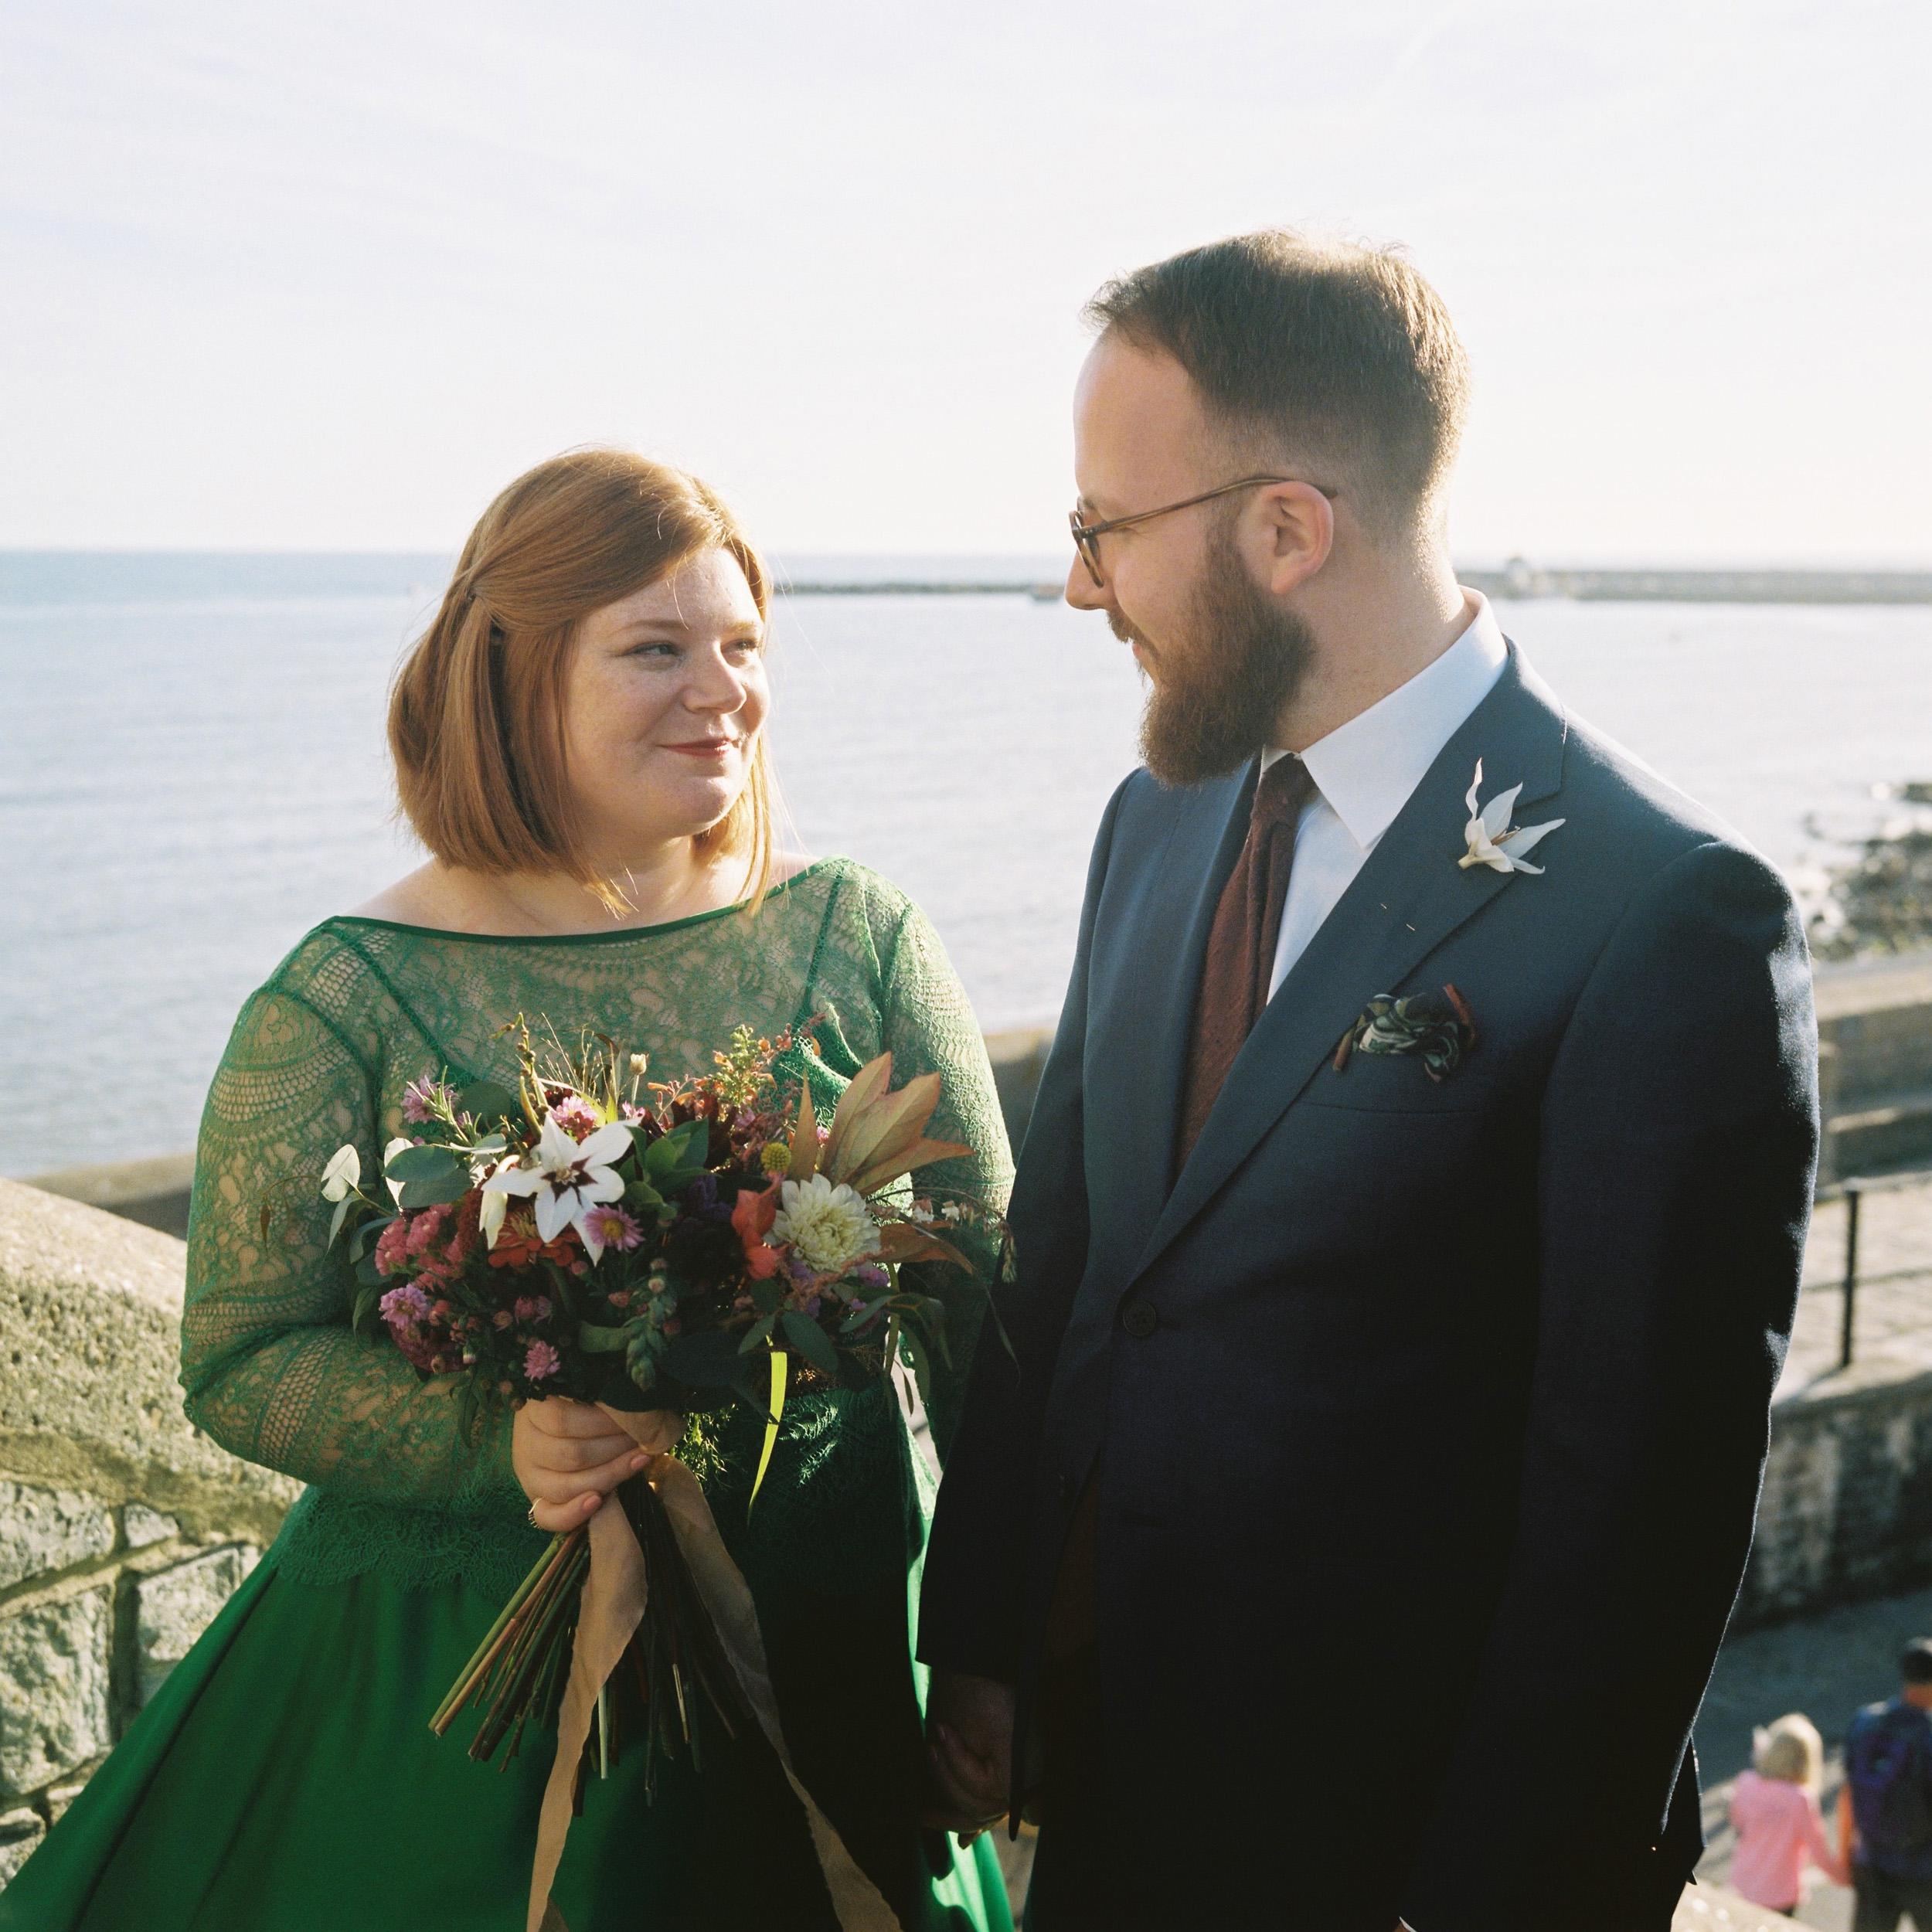 Lucy-Bespoke-Green-Silk-Lace-Wedding-Dress-Kate-Beaumont-Sheffield-2.jpg